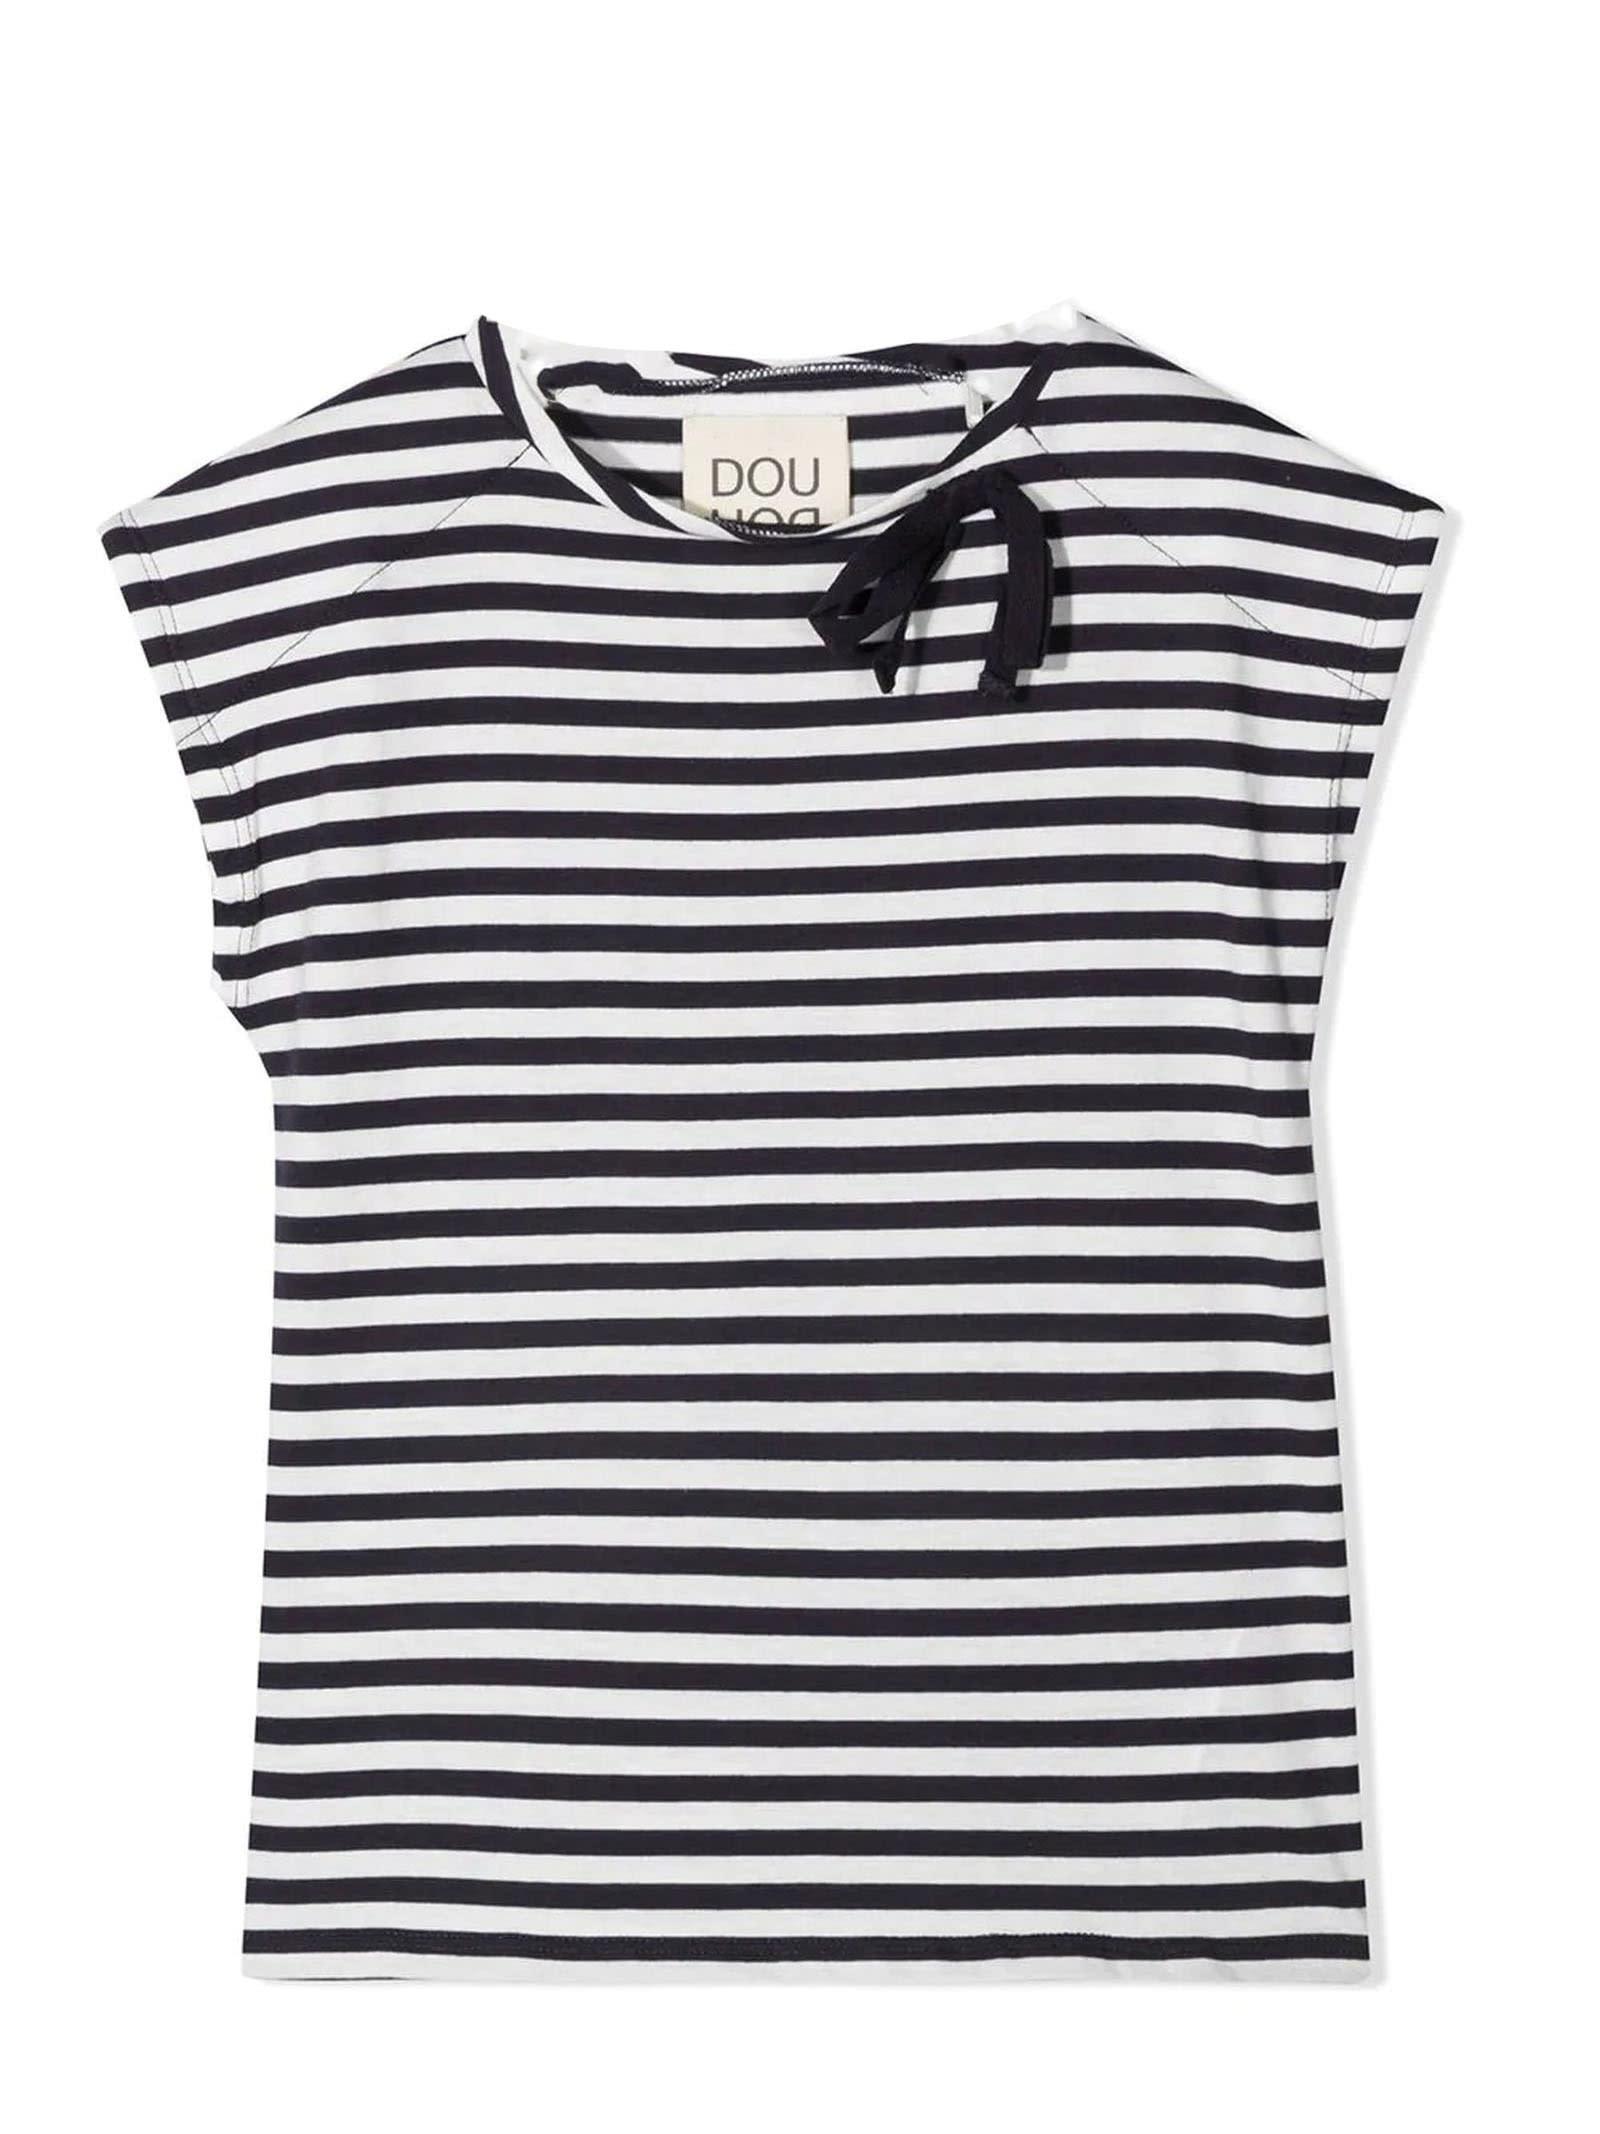 Black And White Cotton-blend T-shirt